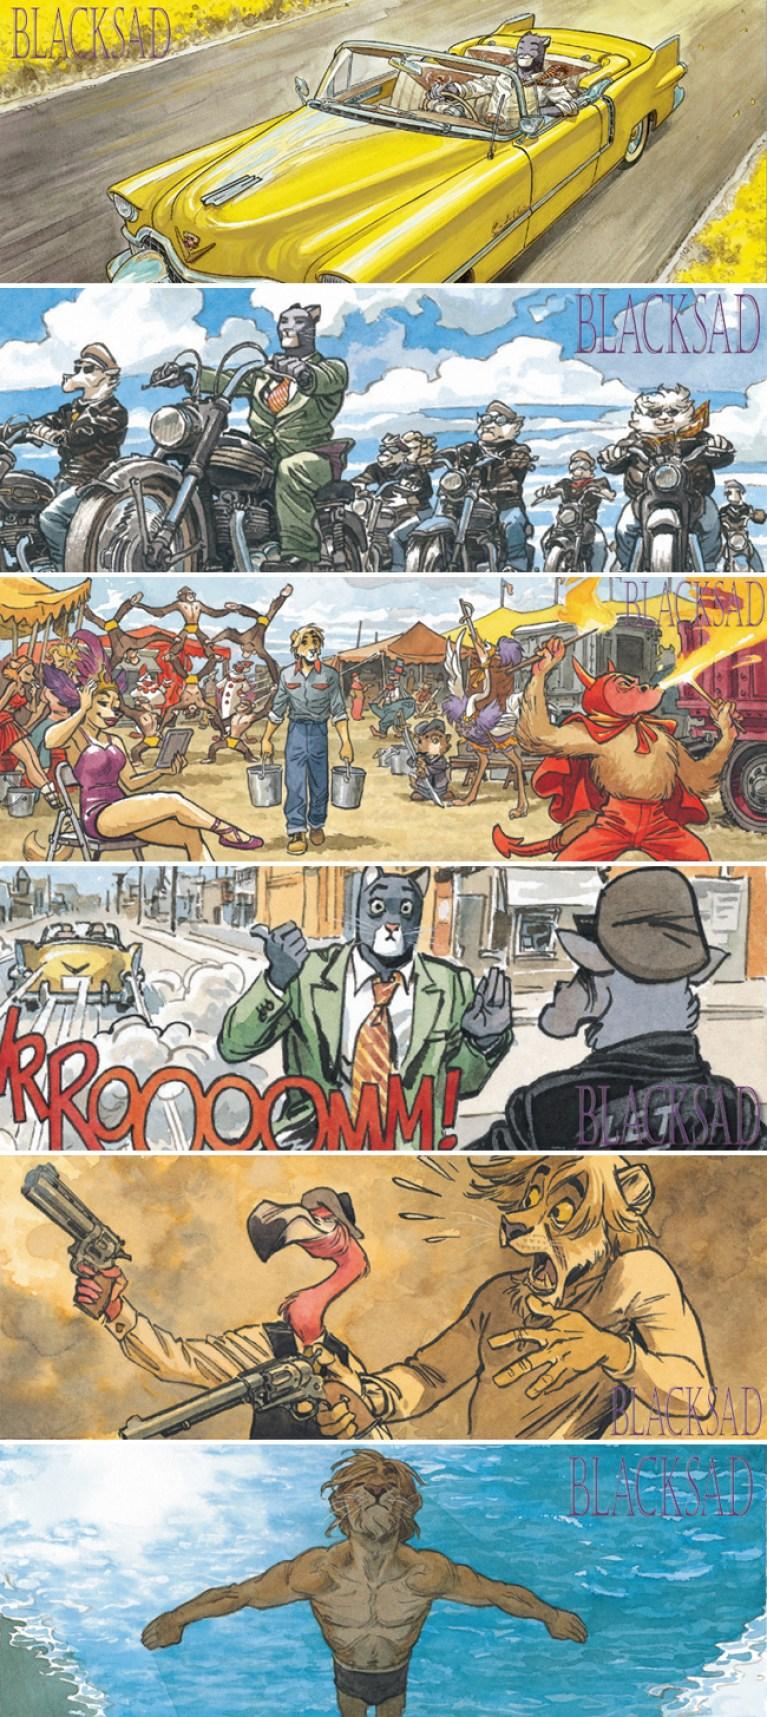 blacksad-canales-guarnido-madrid-comic-expocomic-academiac10